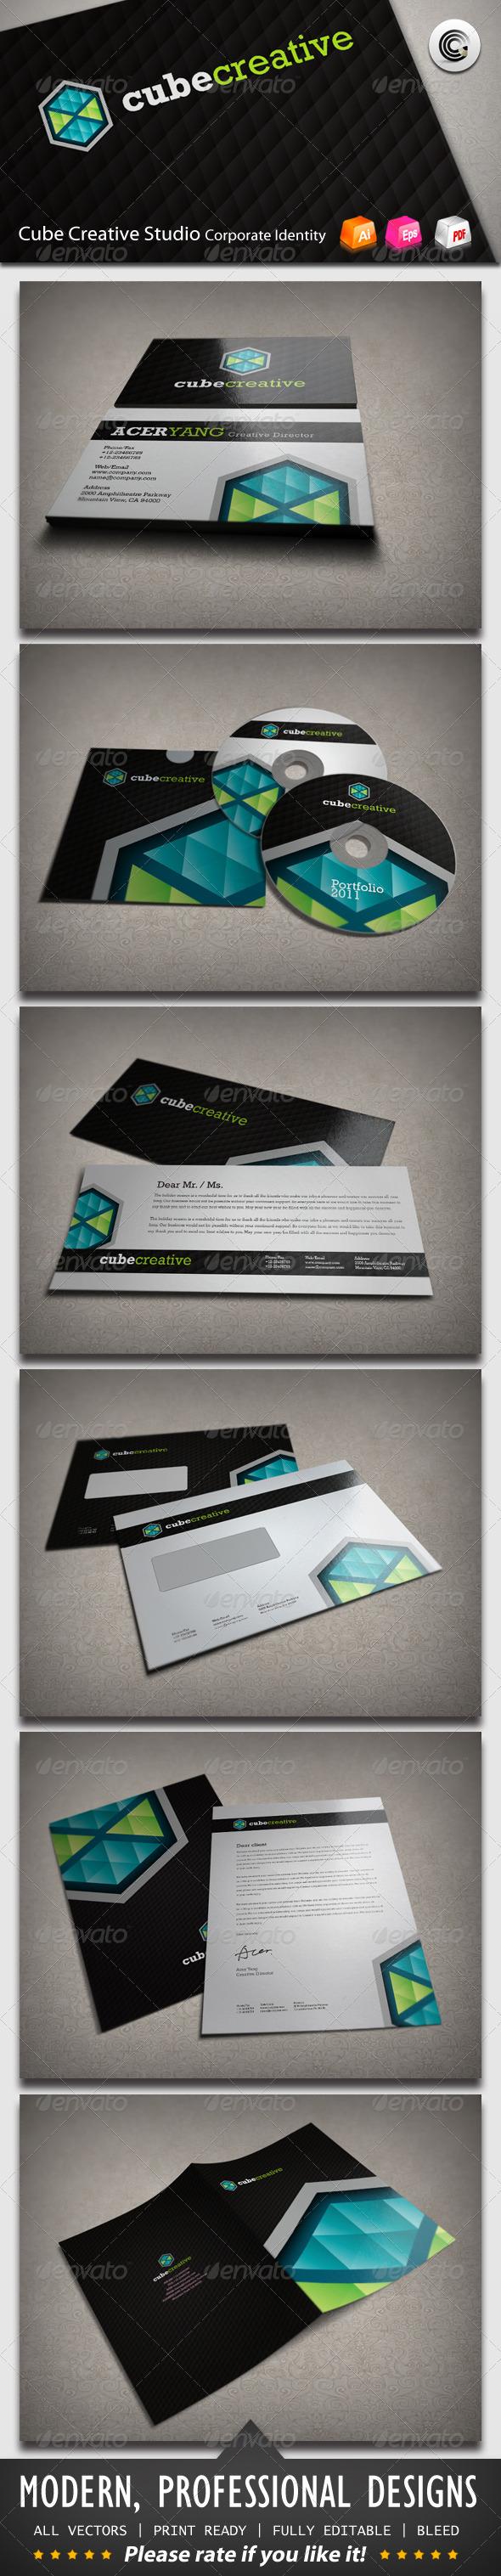 Cube Creative Corporate Identity - Stationery Print Templates